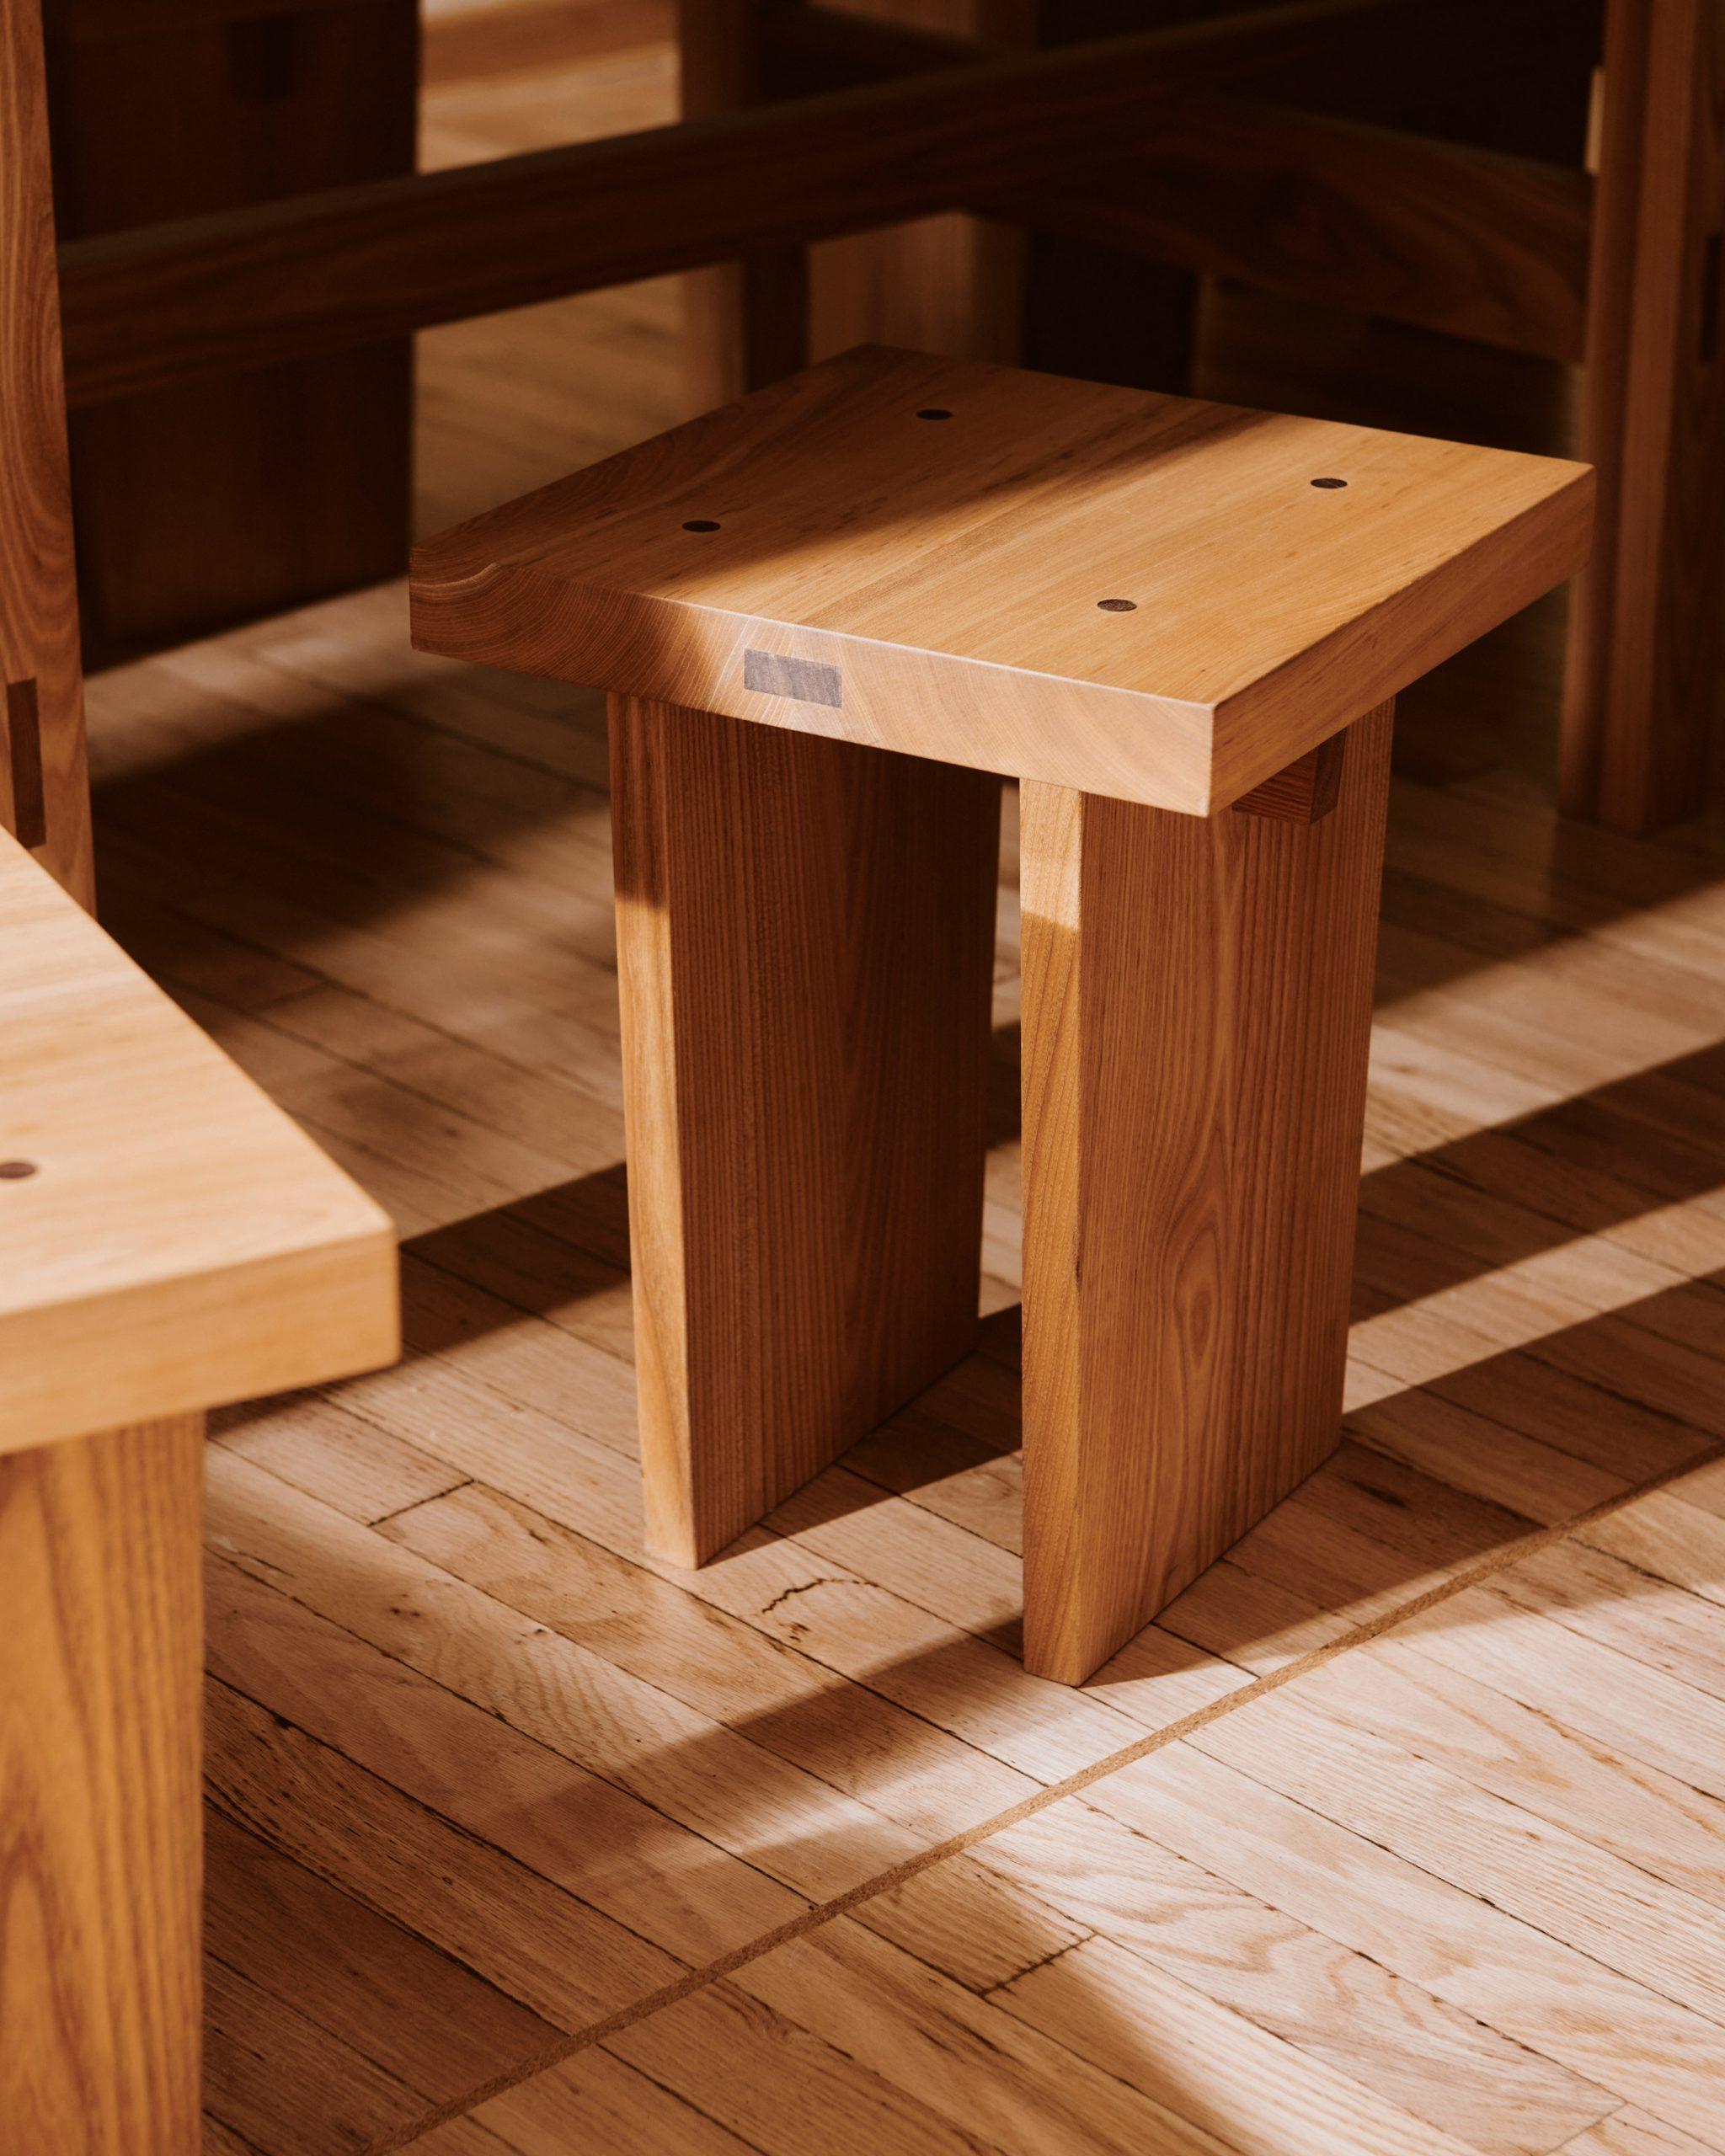 Wooden stools of Sofi bakery in Berlin by Mathias Mentze, Alexander Vedel Ottenstein and Dreimeta